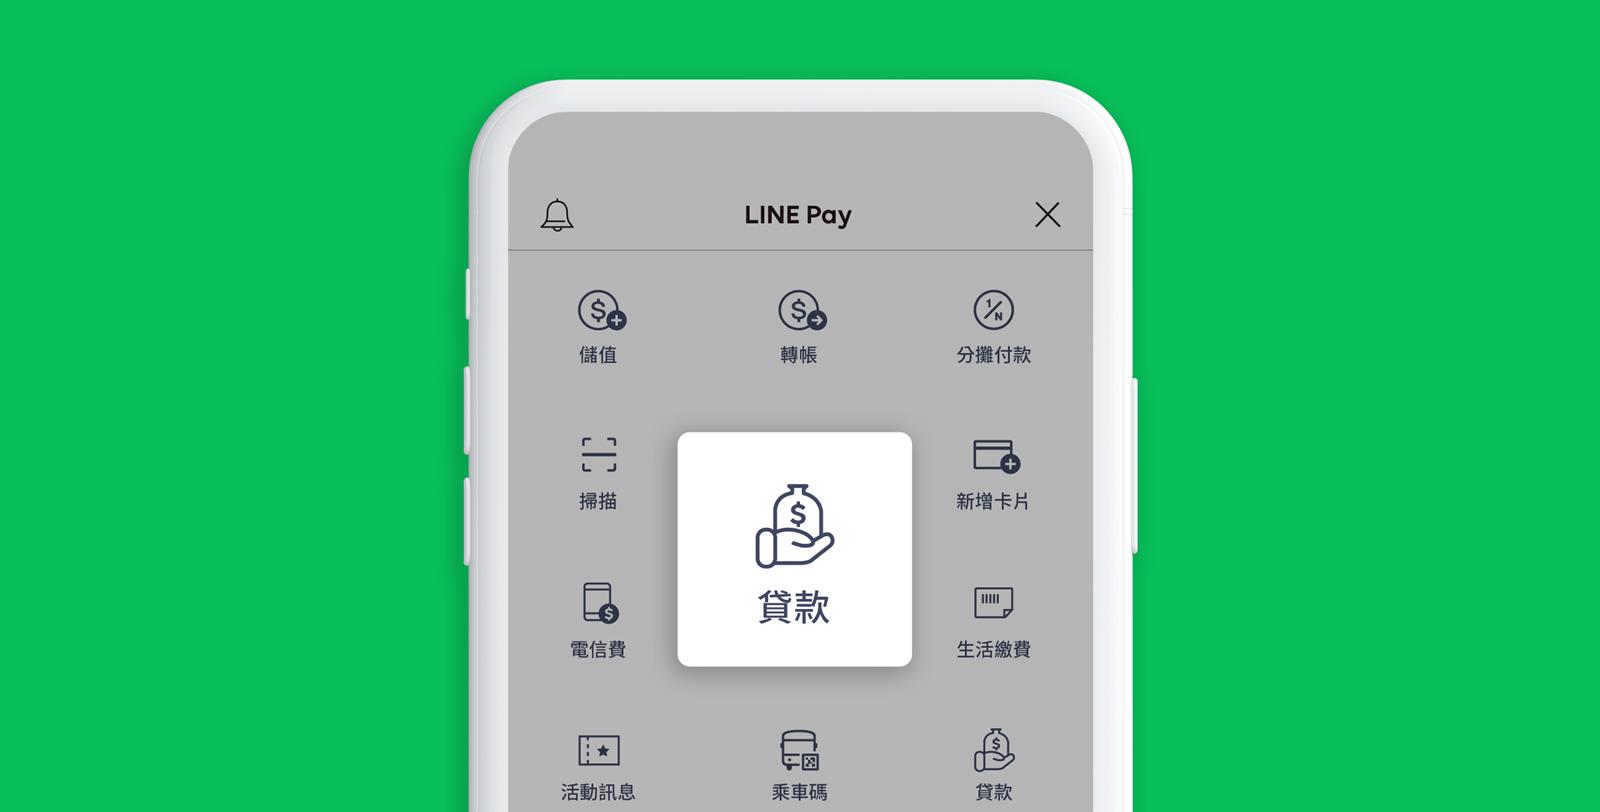 LINE-Pay「貸款」專區攜手 12 家銀行推出「繳稅季專案」,用戶透過手機可一次查詢 12 家銀行貸款專案。.png @3C 達人廖阿輝